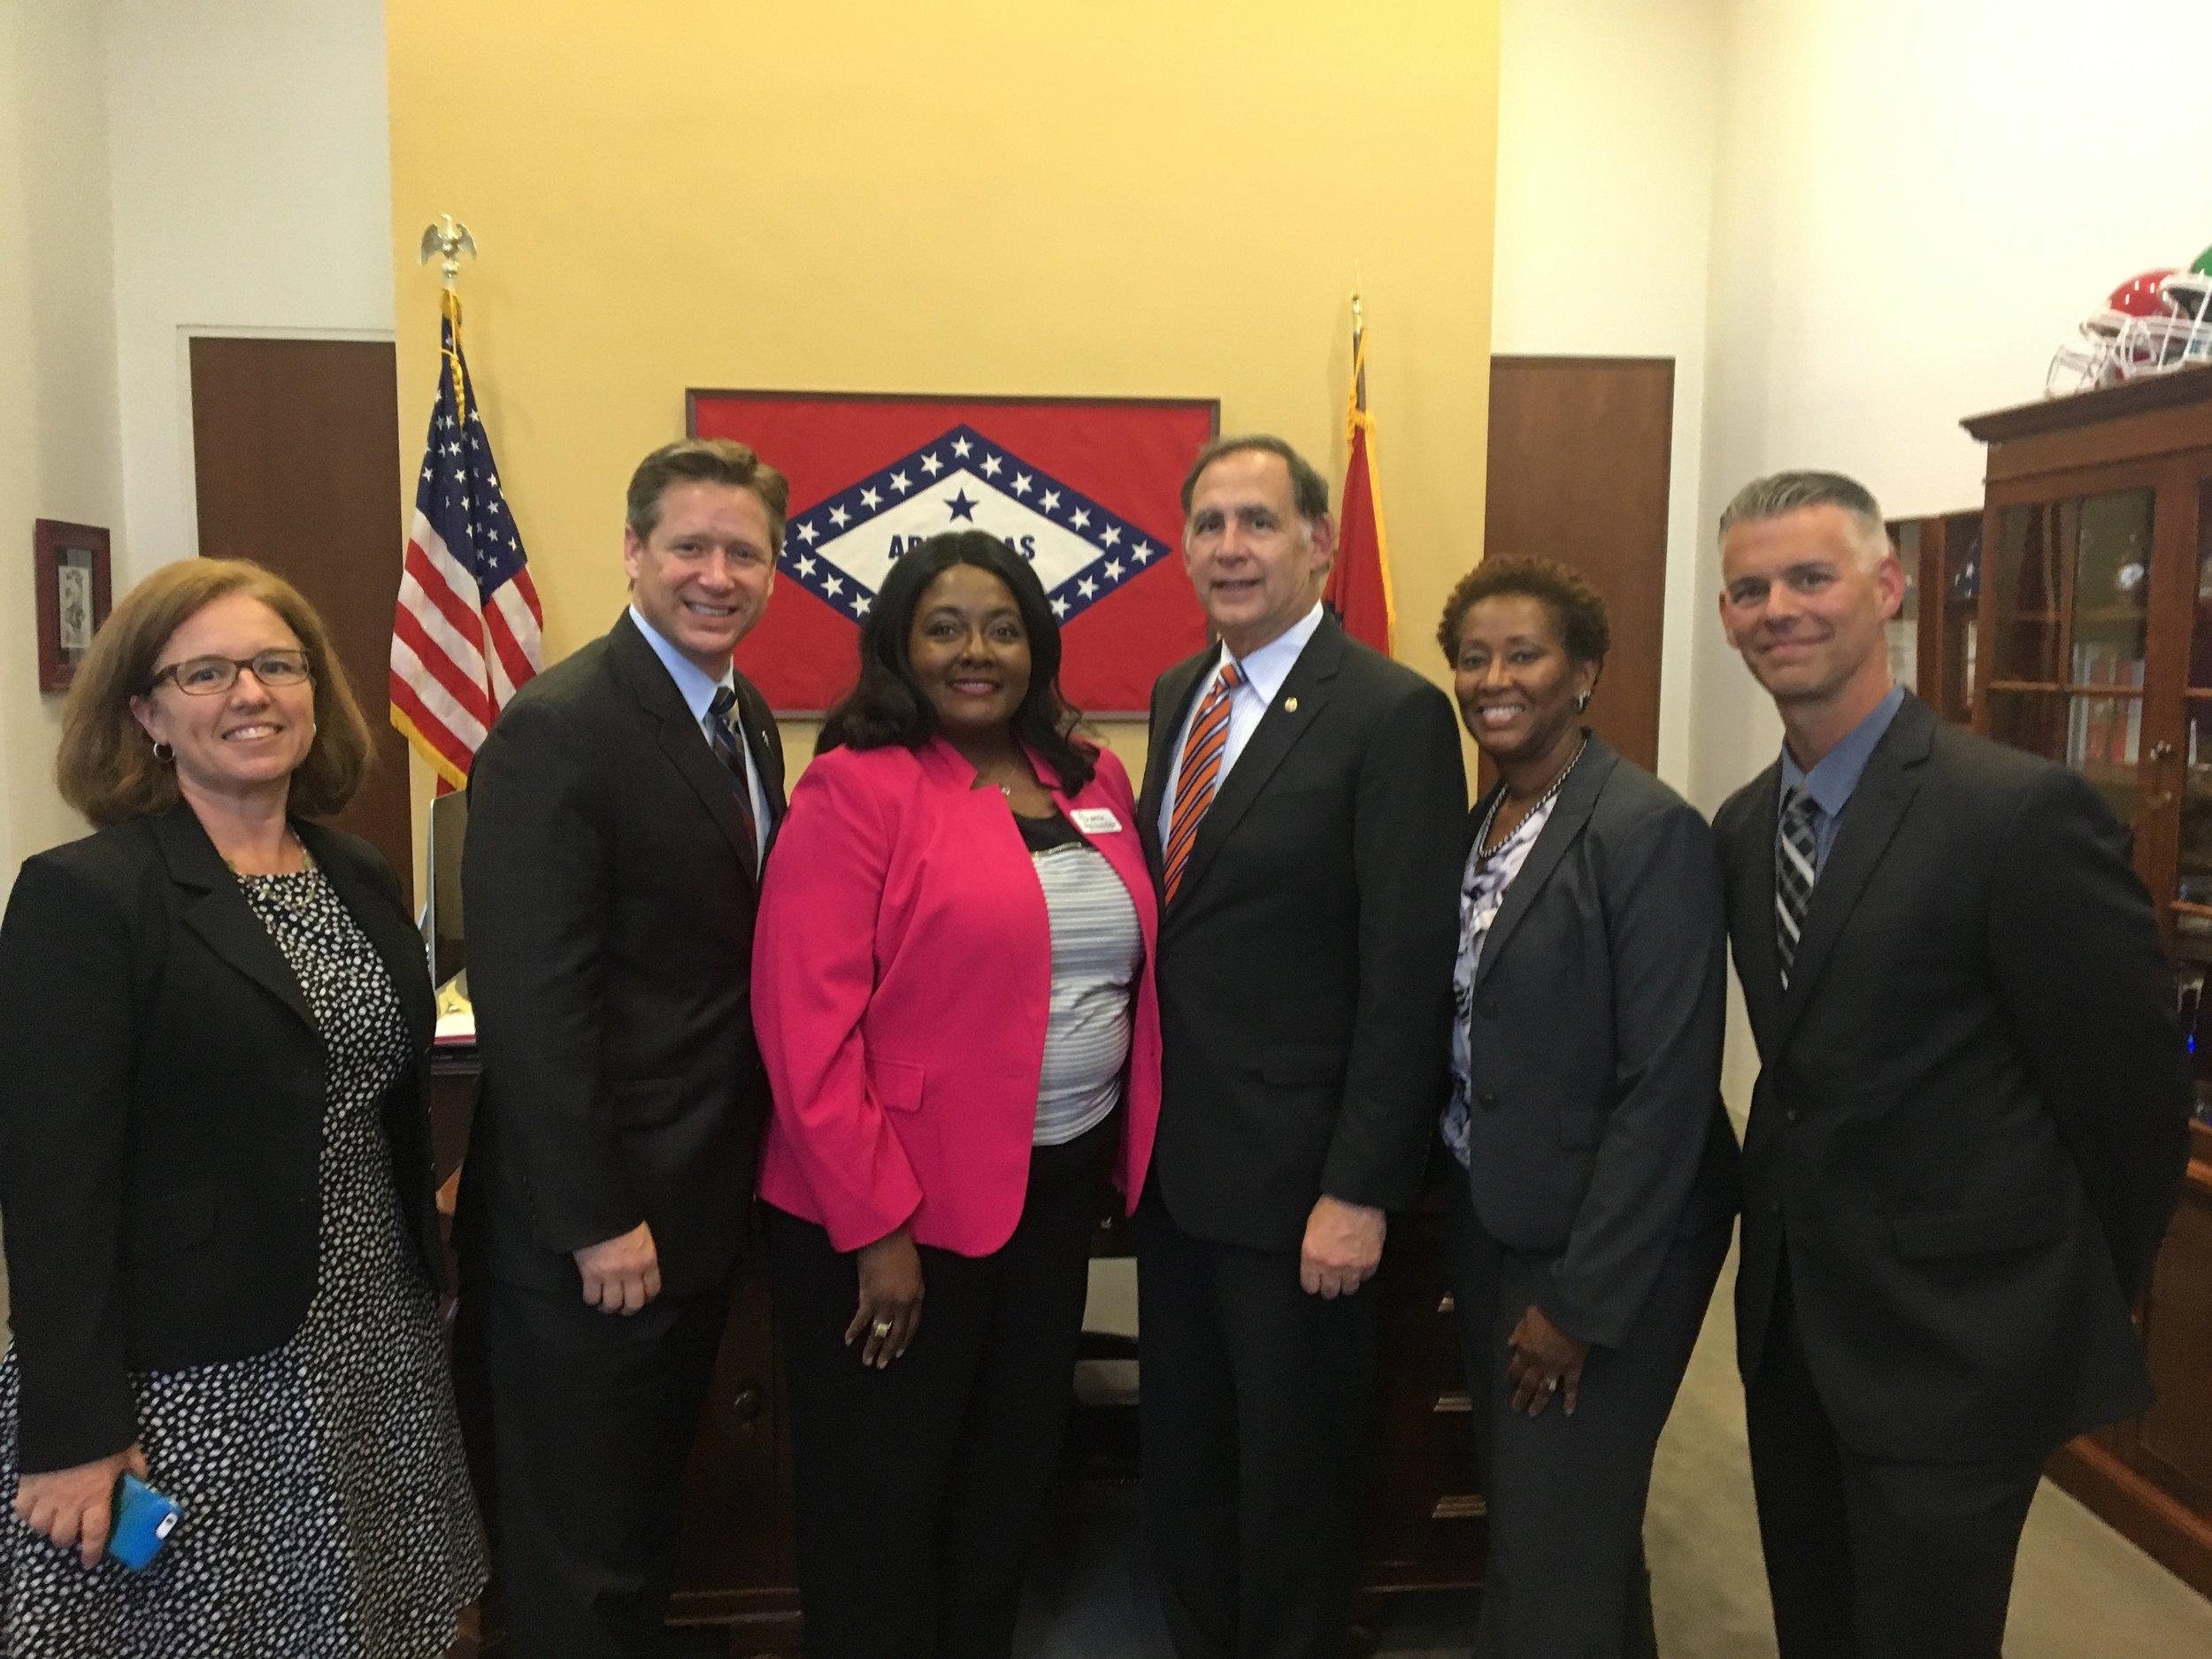 Home visiting model leaders meet with Senator Boozman at his office in Washington, D.C.